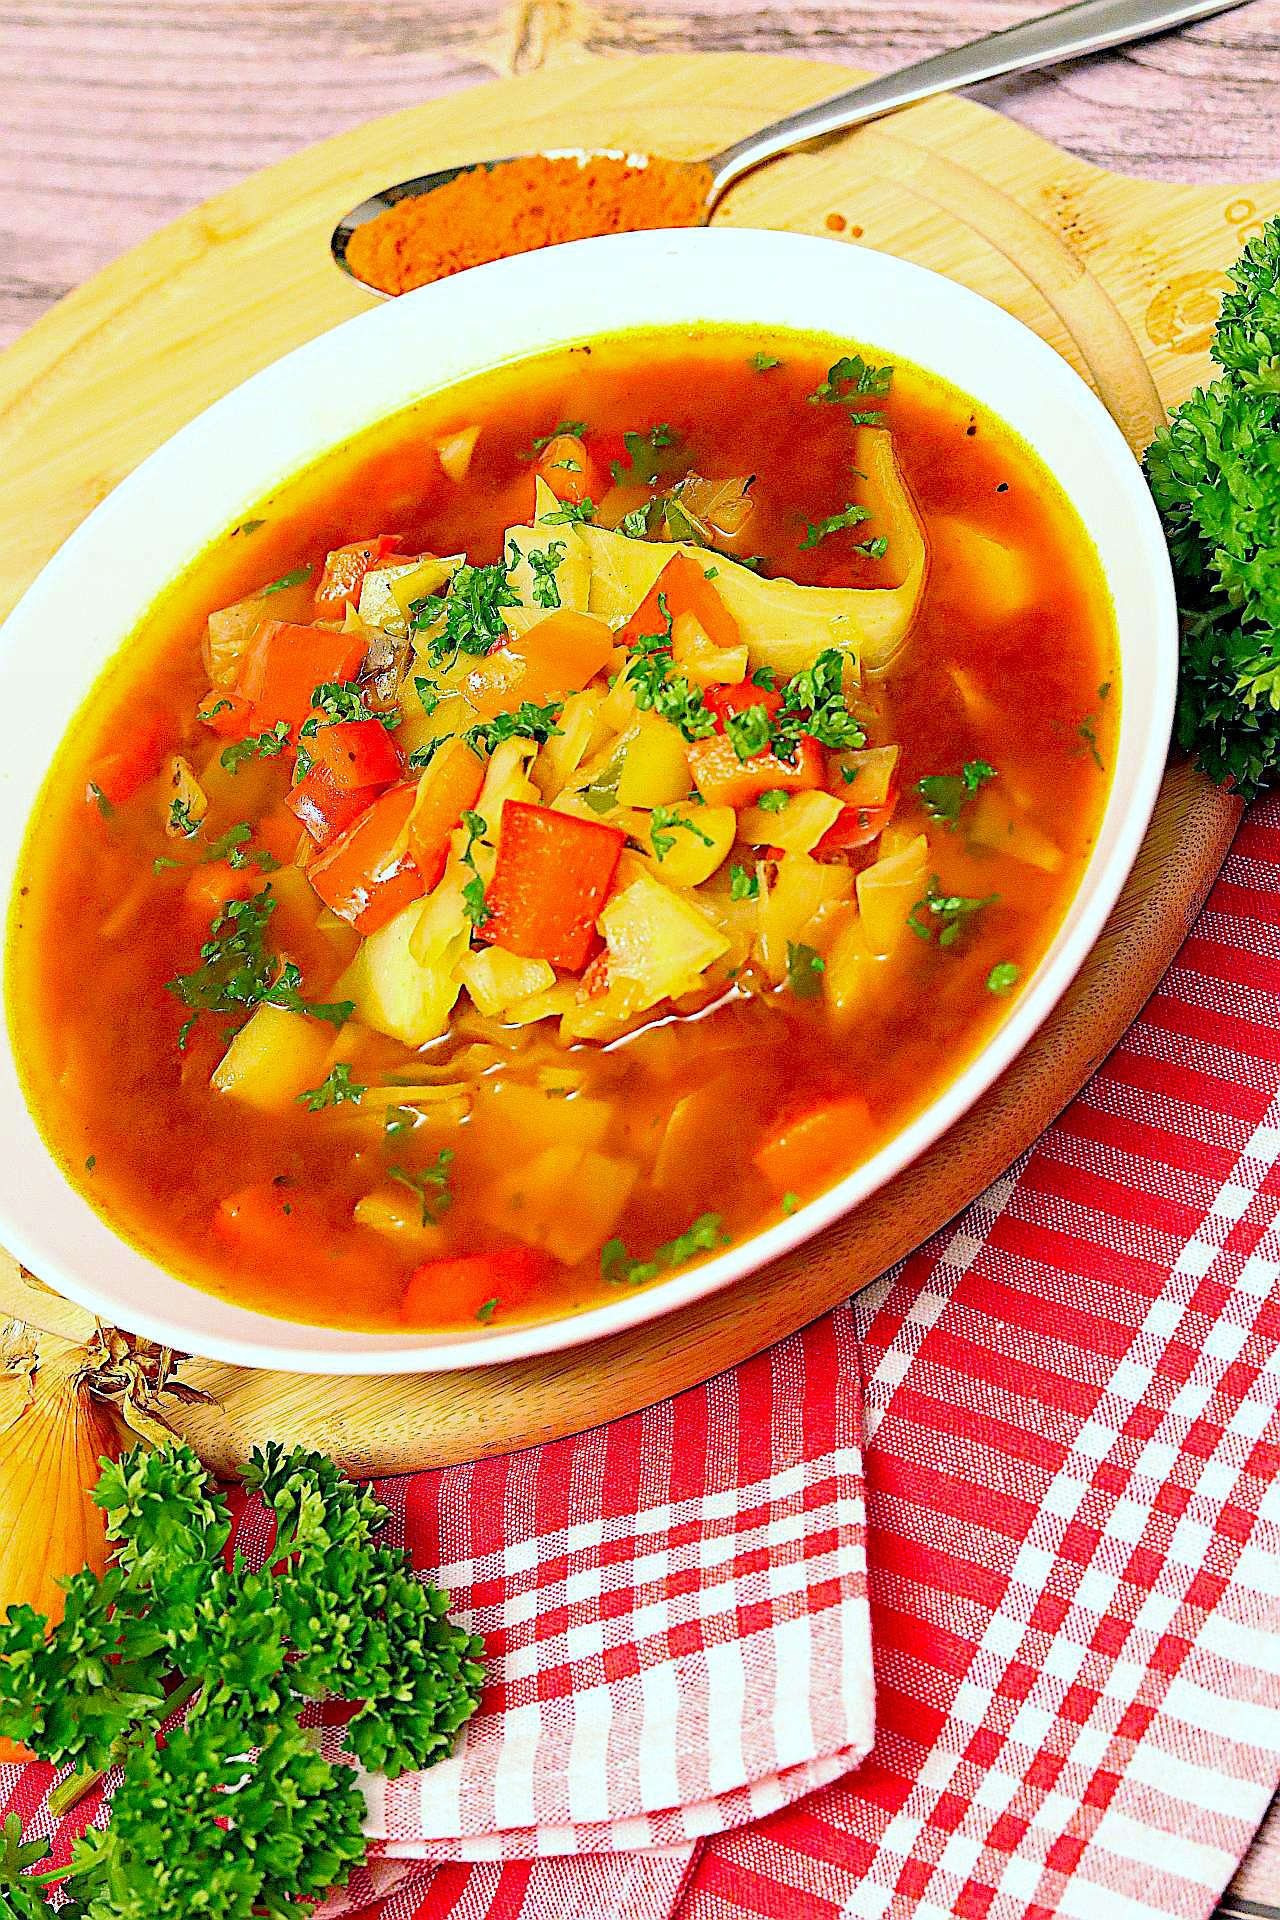 Paprika-Kohl-Eintopf, vegan und herzhaft